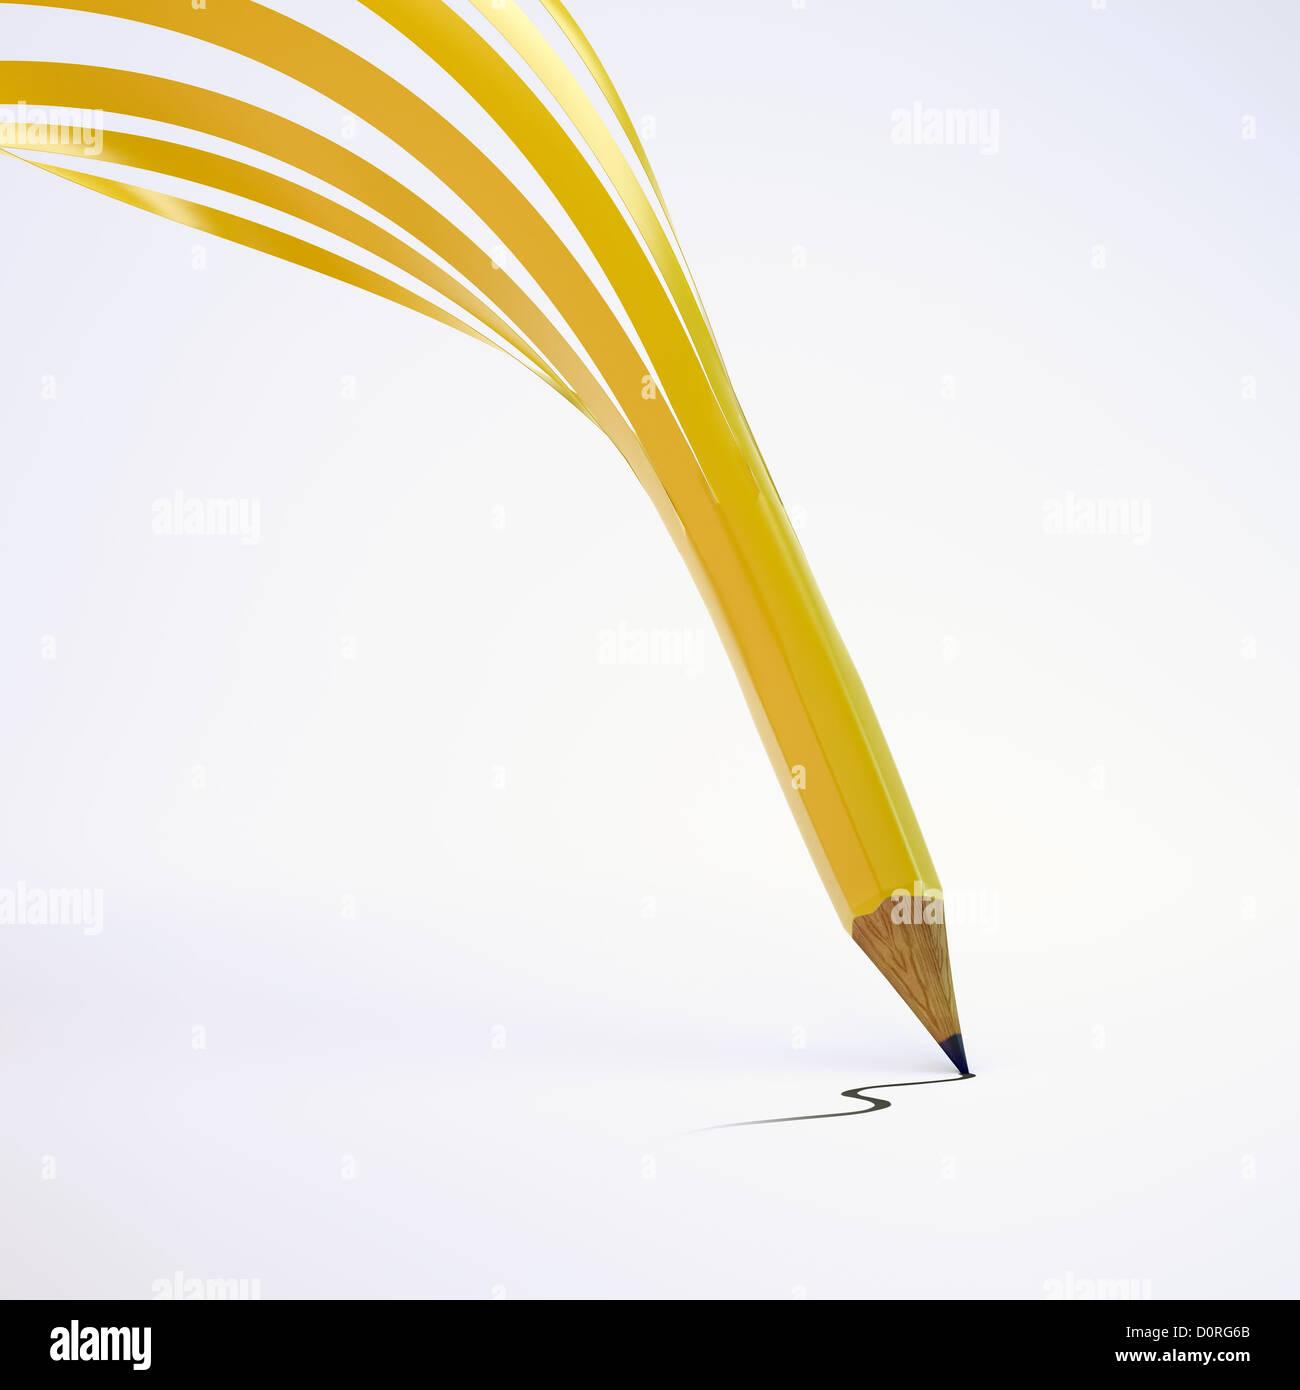 Magic pencil - Stock Image